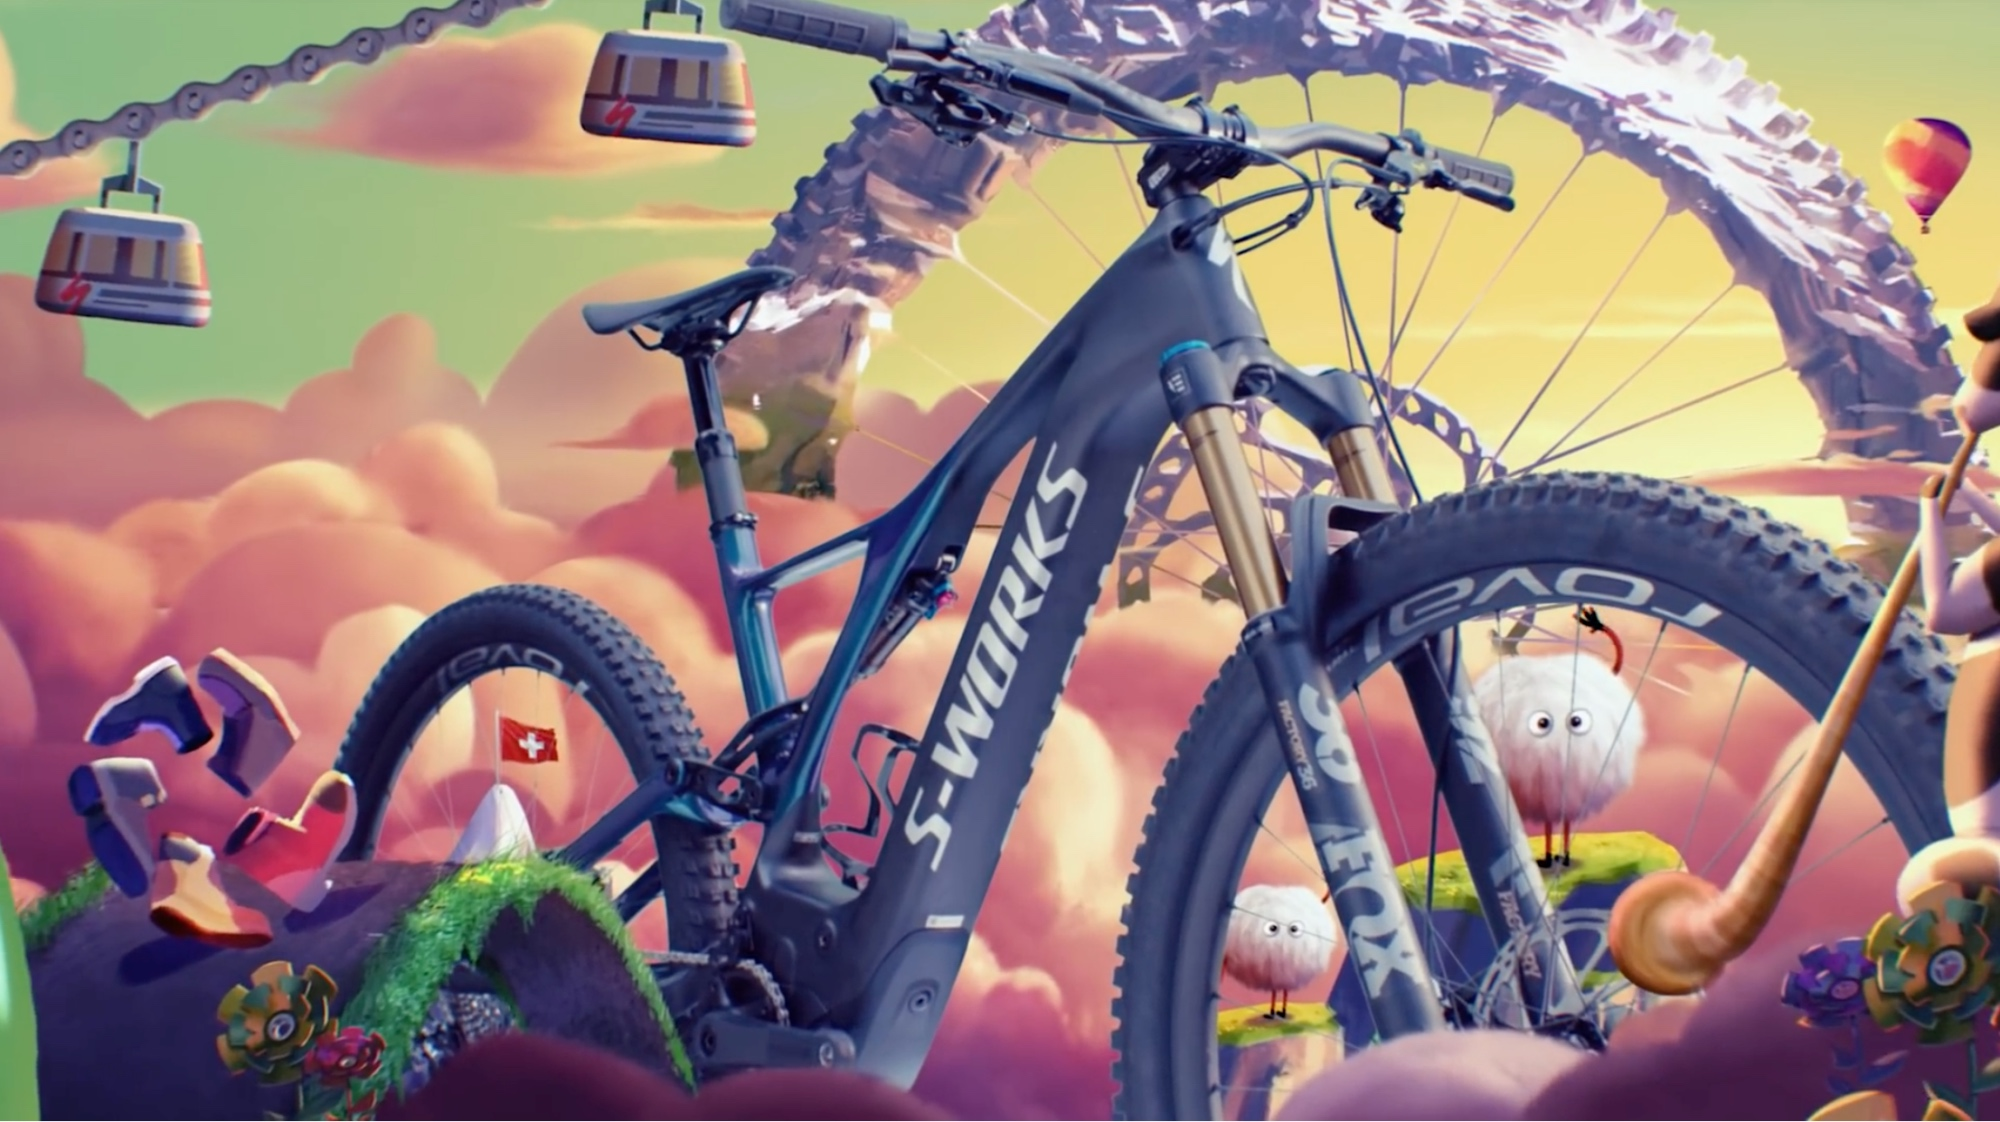 Best bike marketing video ever?